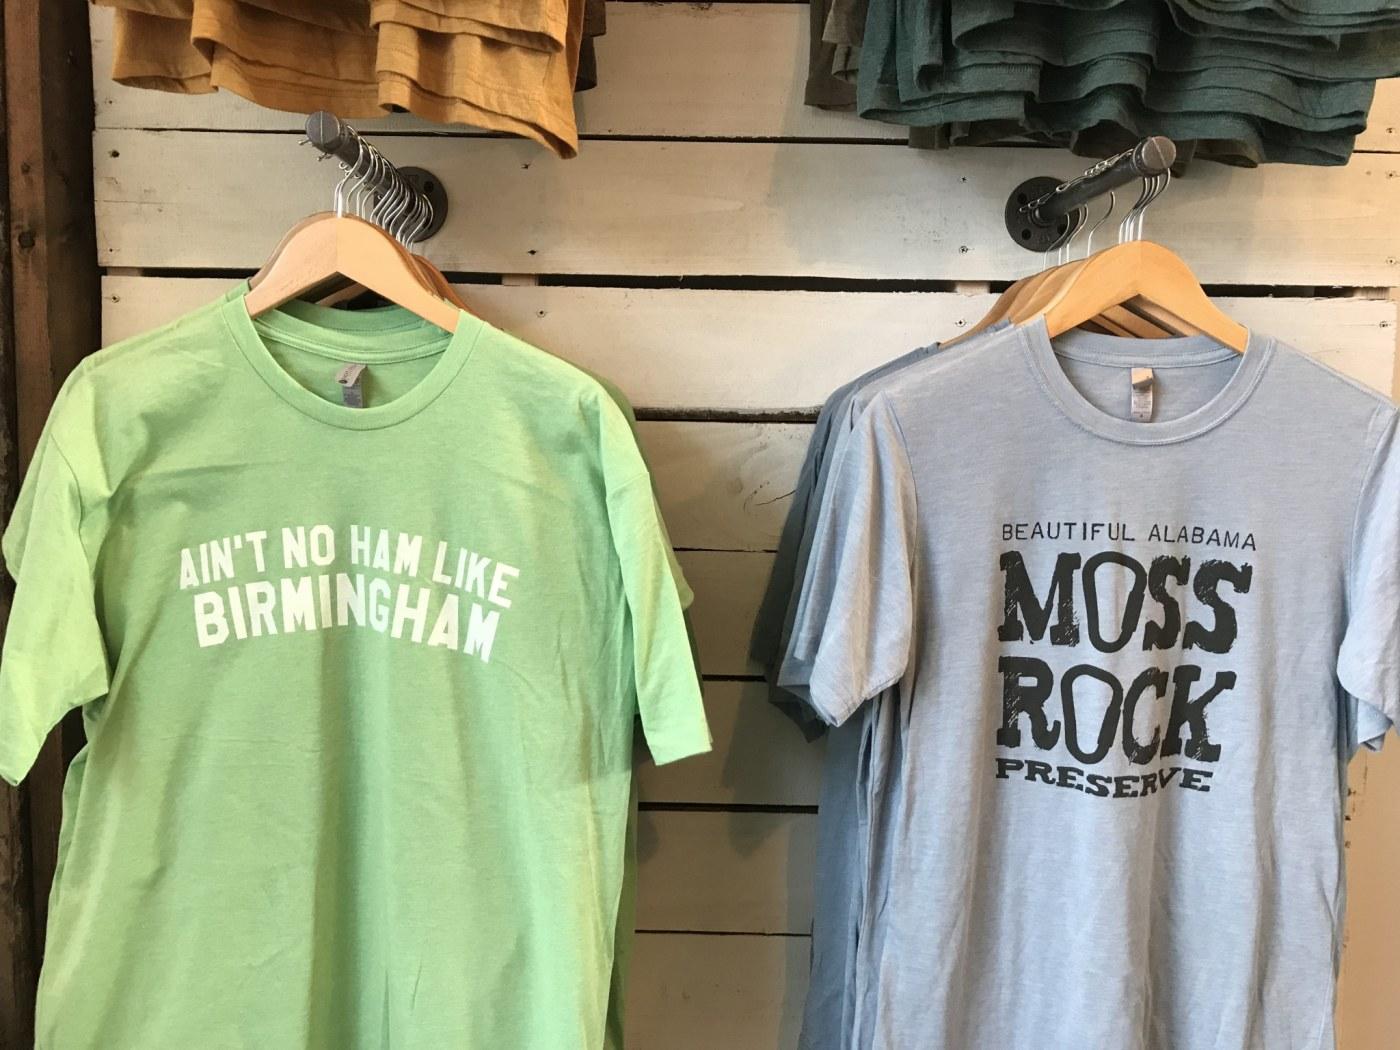 Birmingham, Alabama,Original B'ham Apparel Co., The Battery, t-shirts, tees, Moss Rock